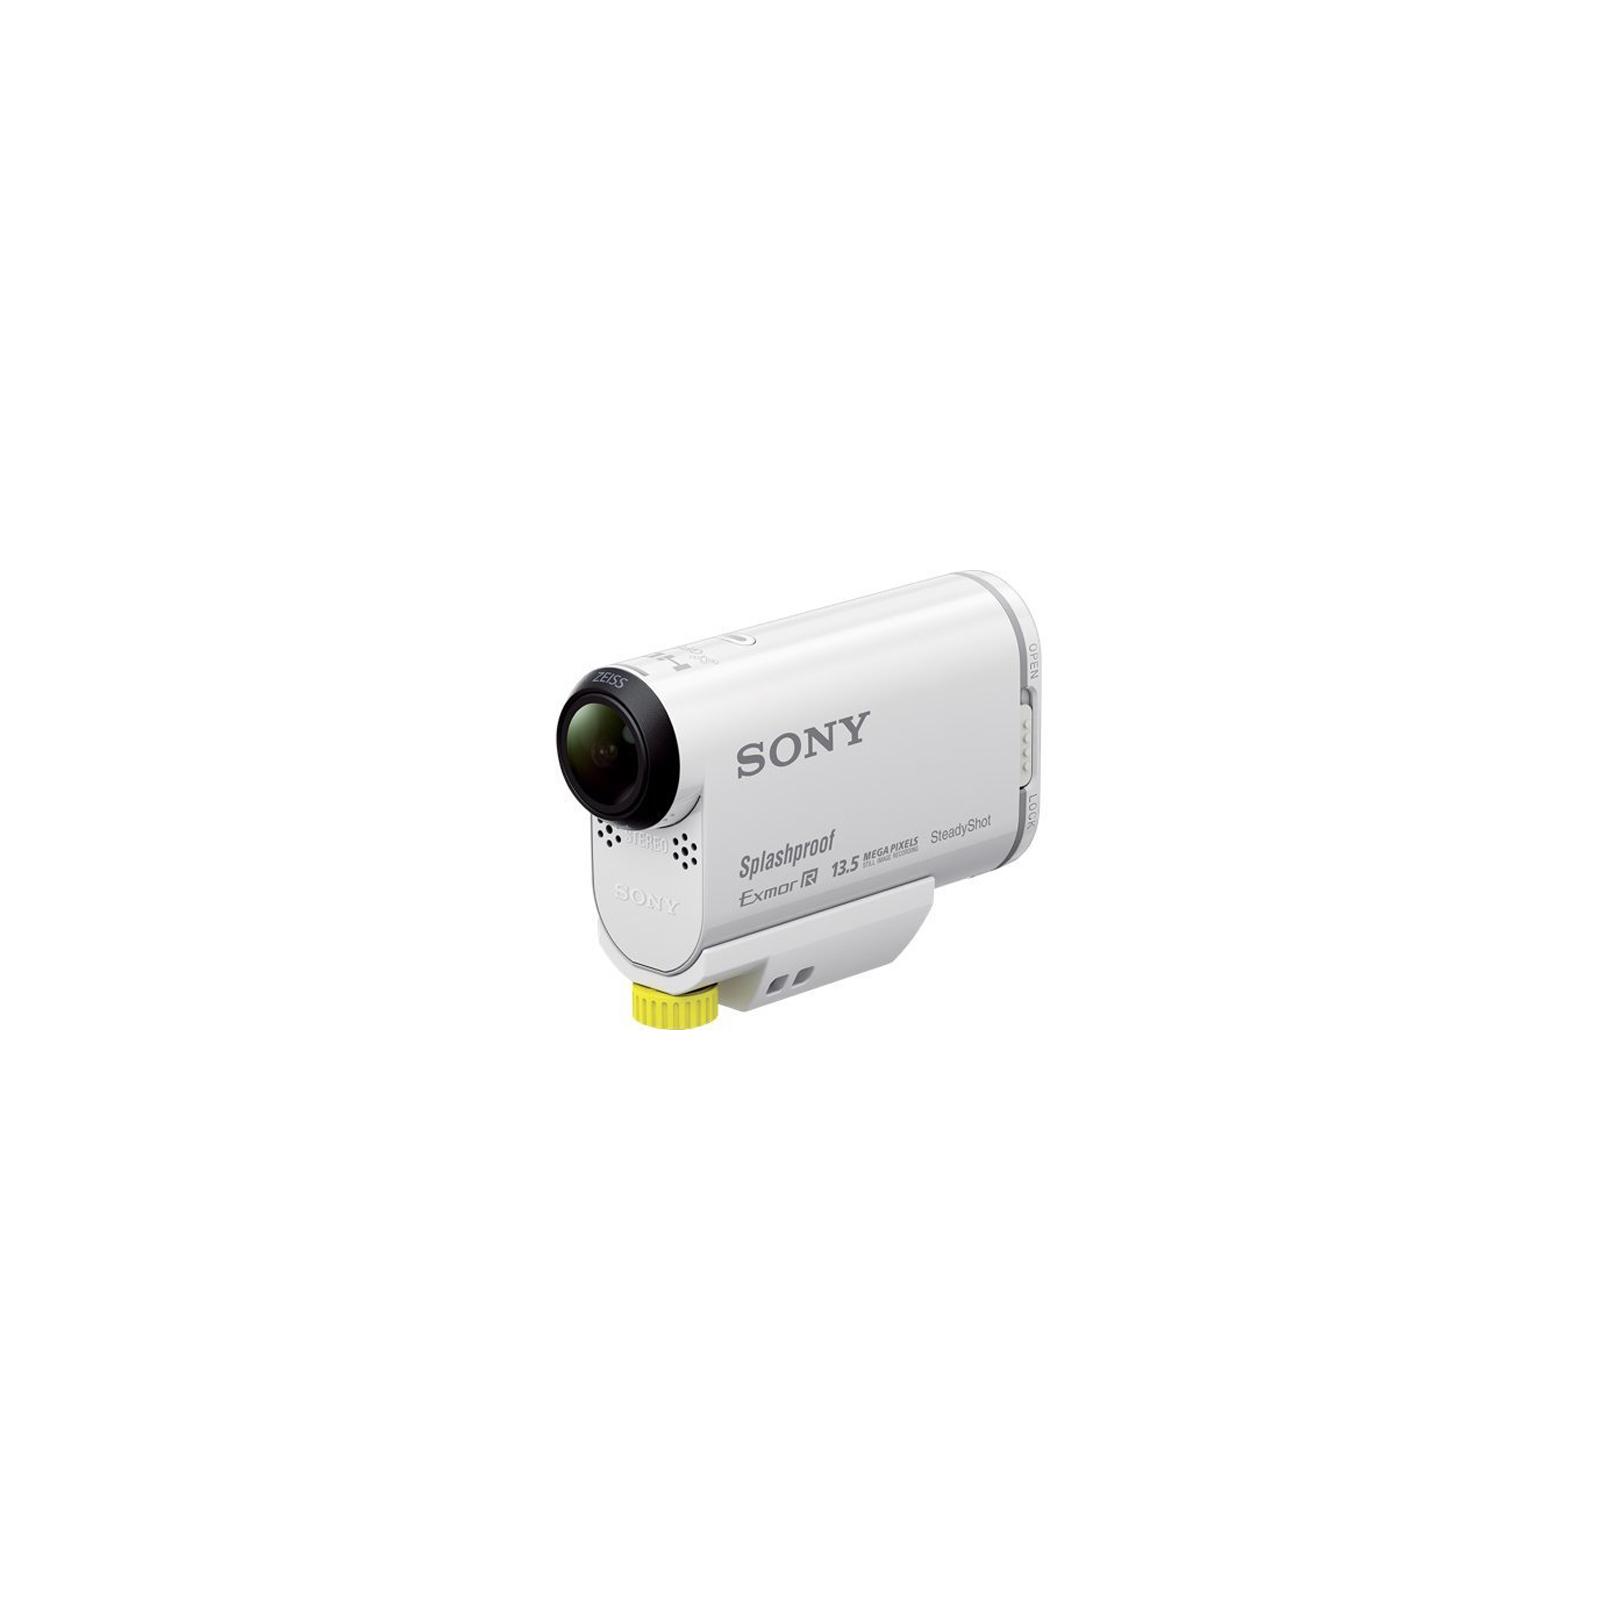 Экшн-камера SONY HDR-AS100V w/RM-LVR1 (HDRAS100VR.CEN) изображение 3